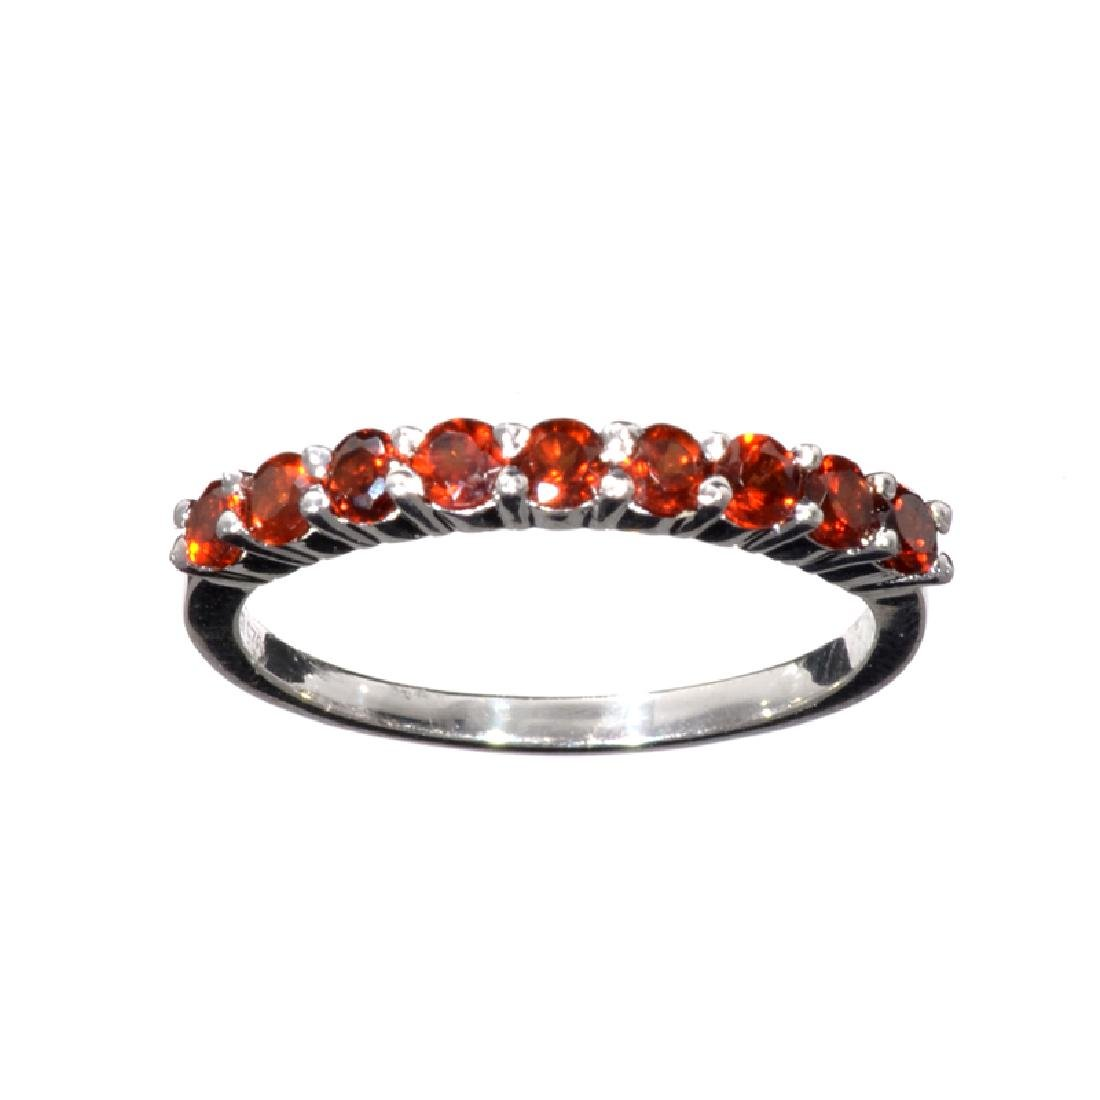 APP: 1k Fine Jewelry 1.00CT Round Cut Almandite Garnet